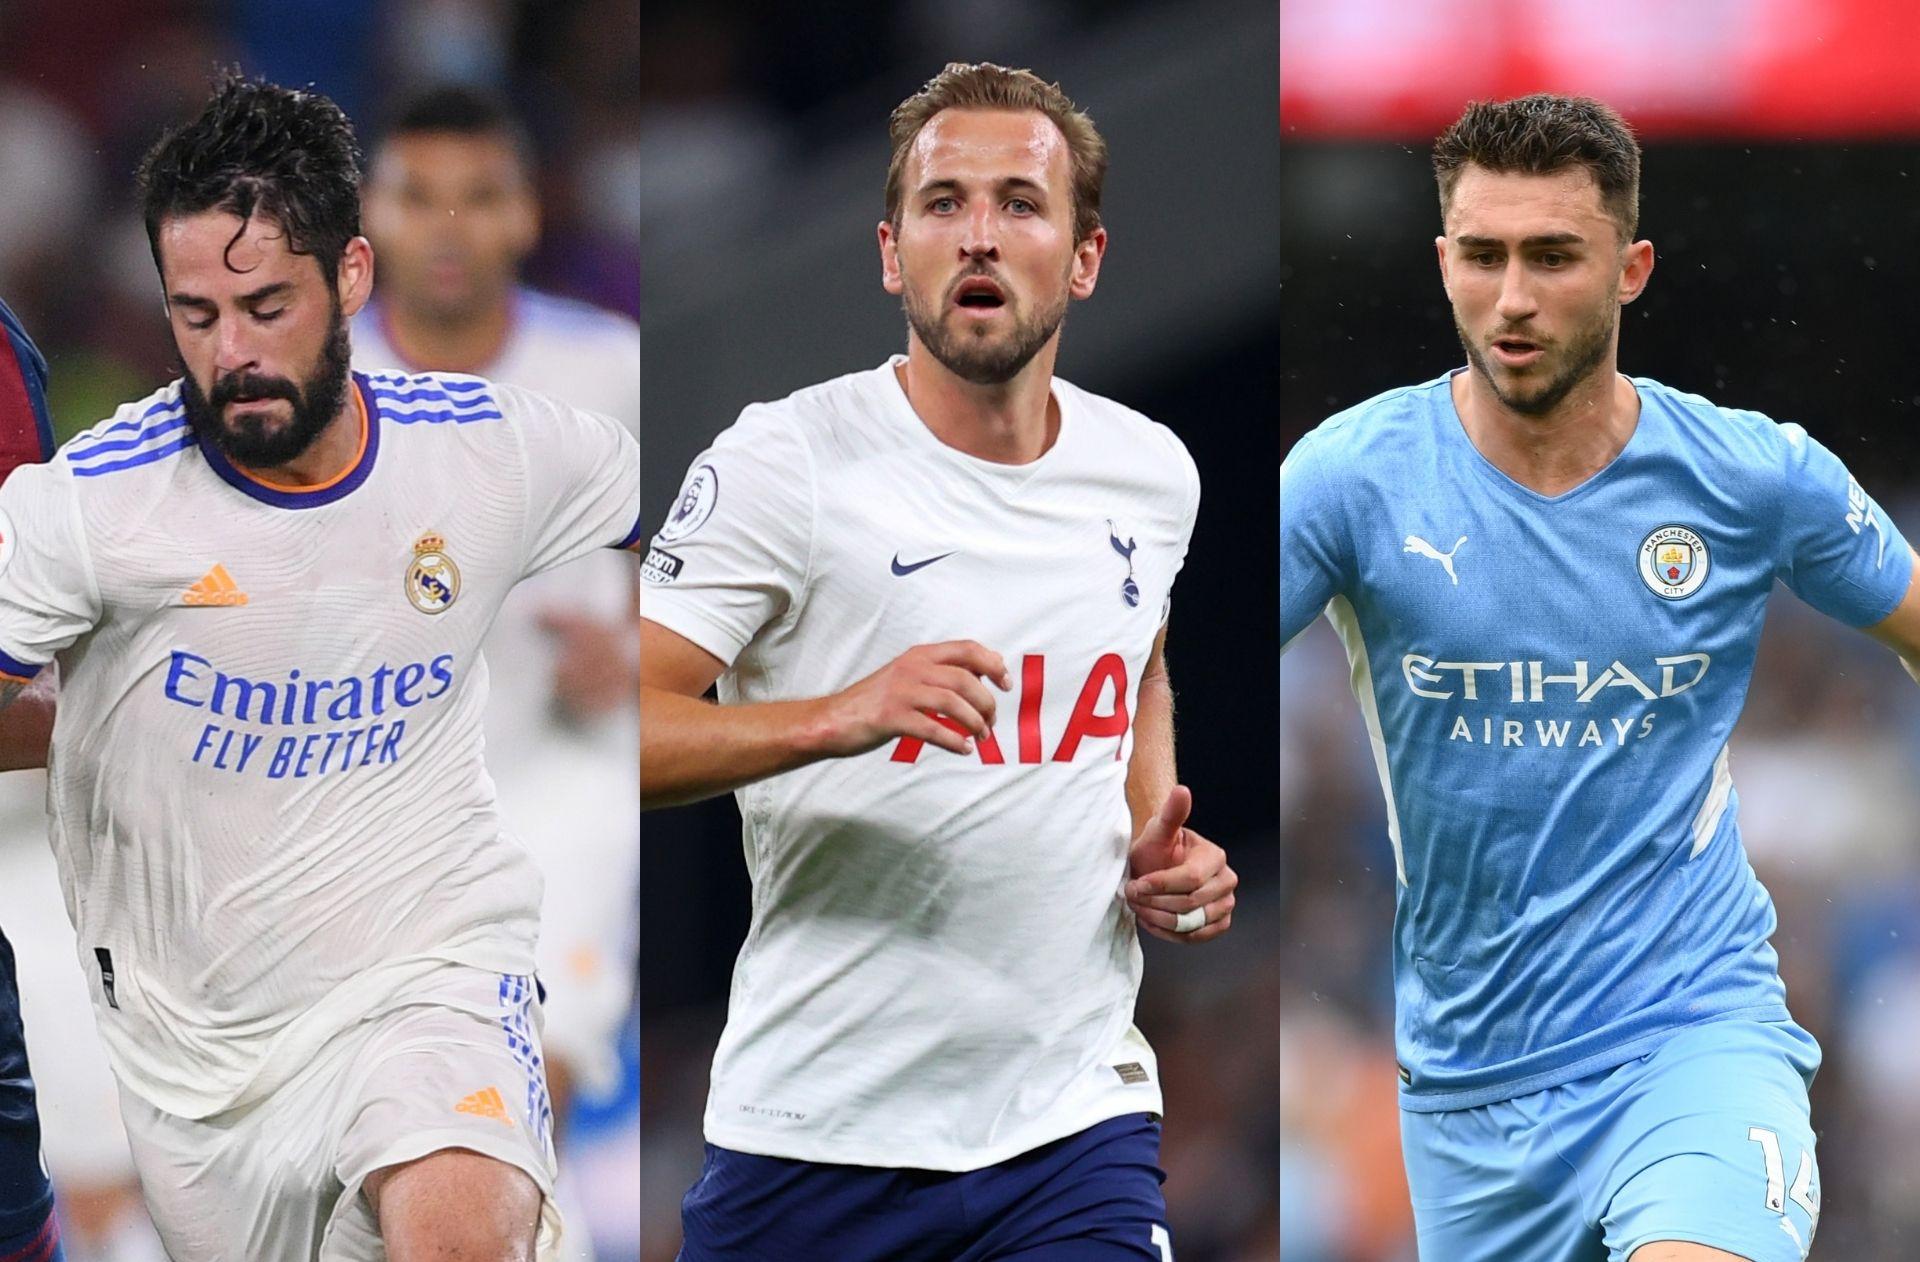 Isco Real Madrid, Harry Kane - Tottenham, Aymeric Laporte - Man City